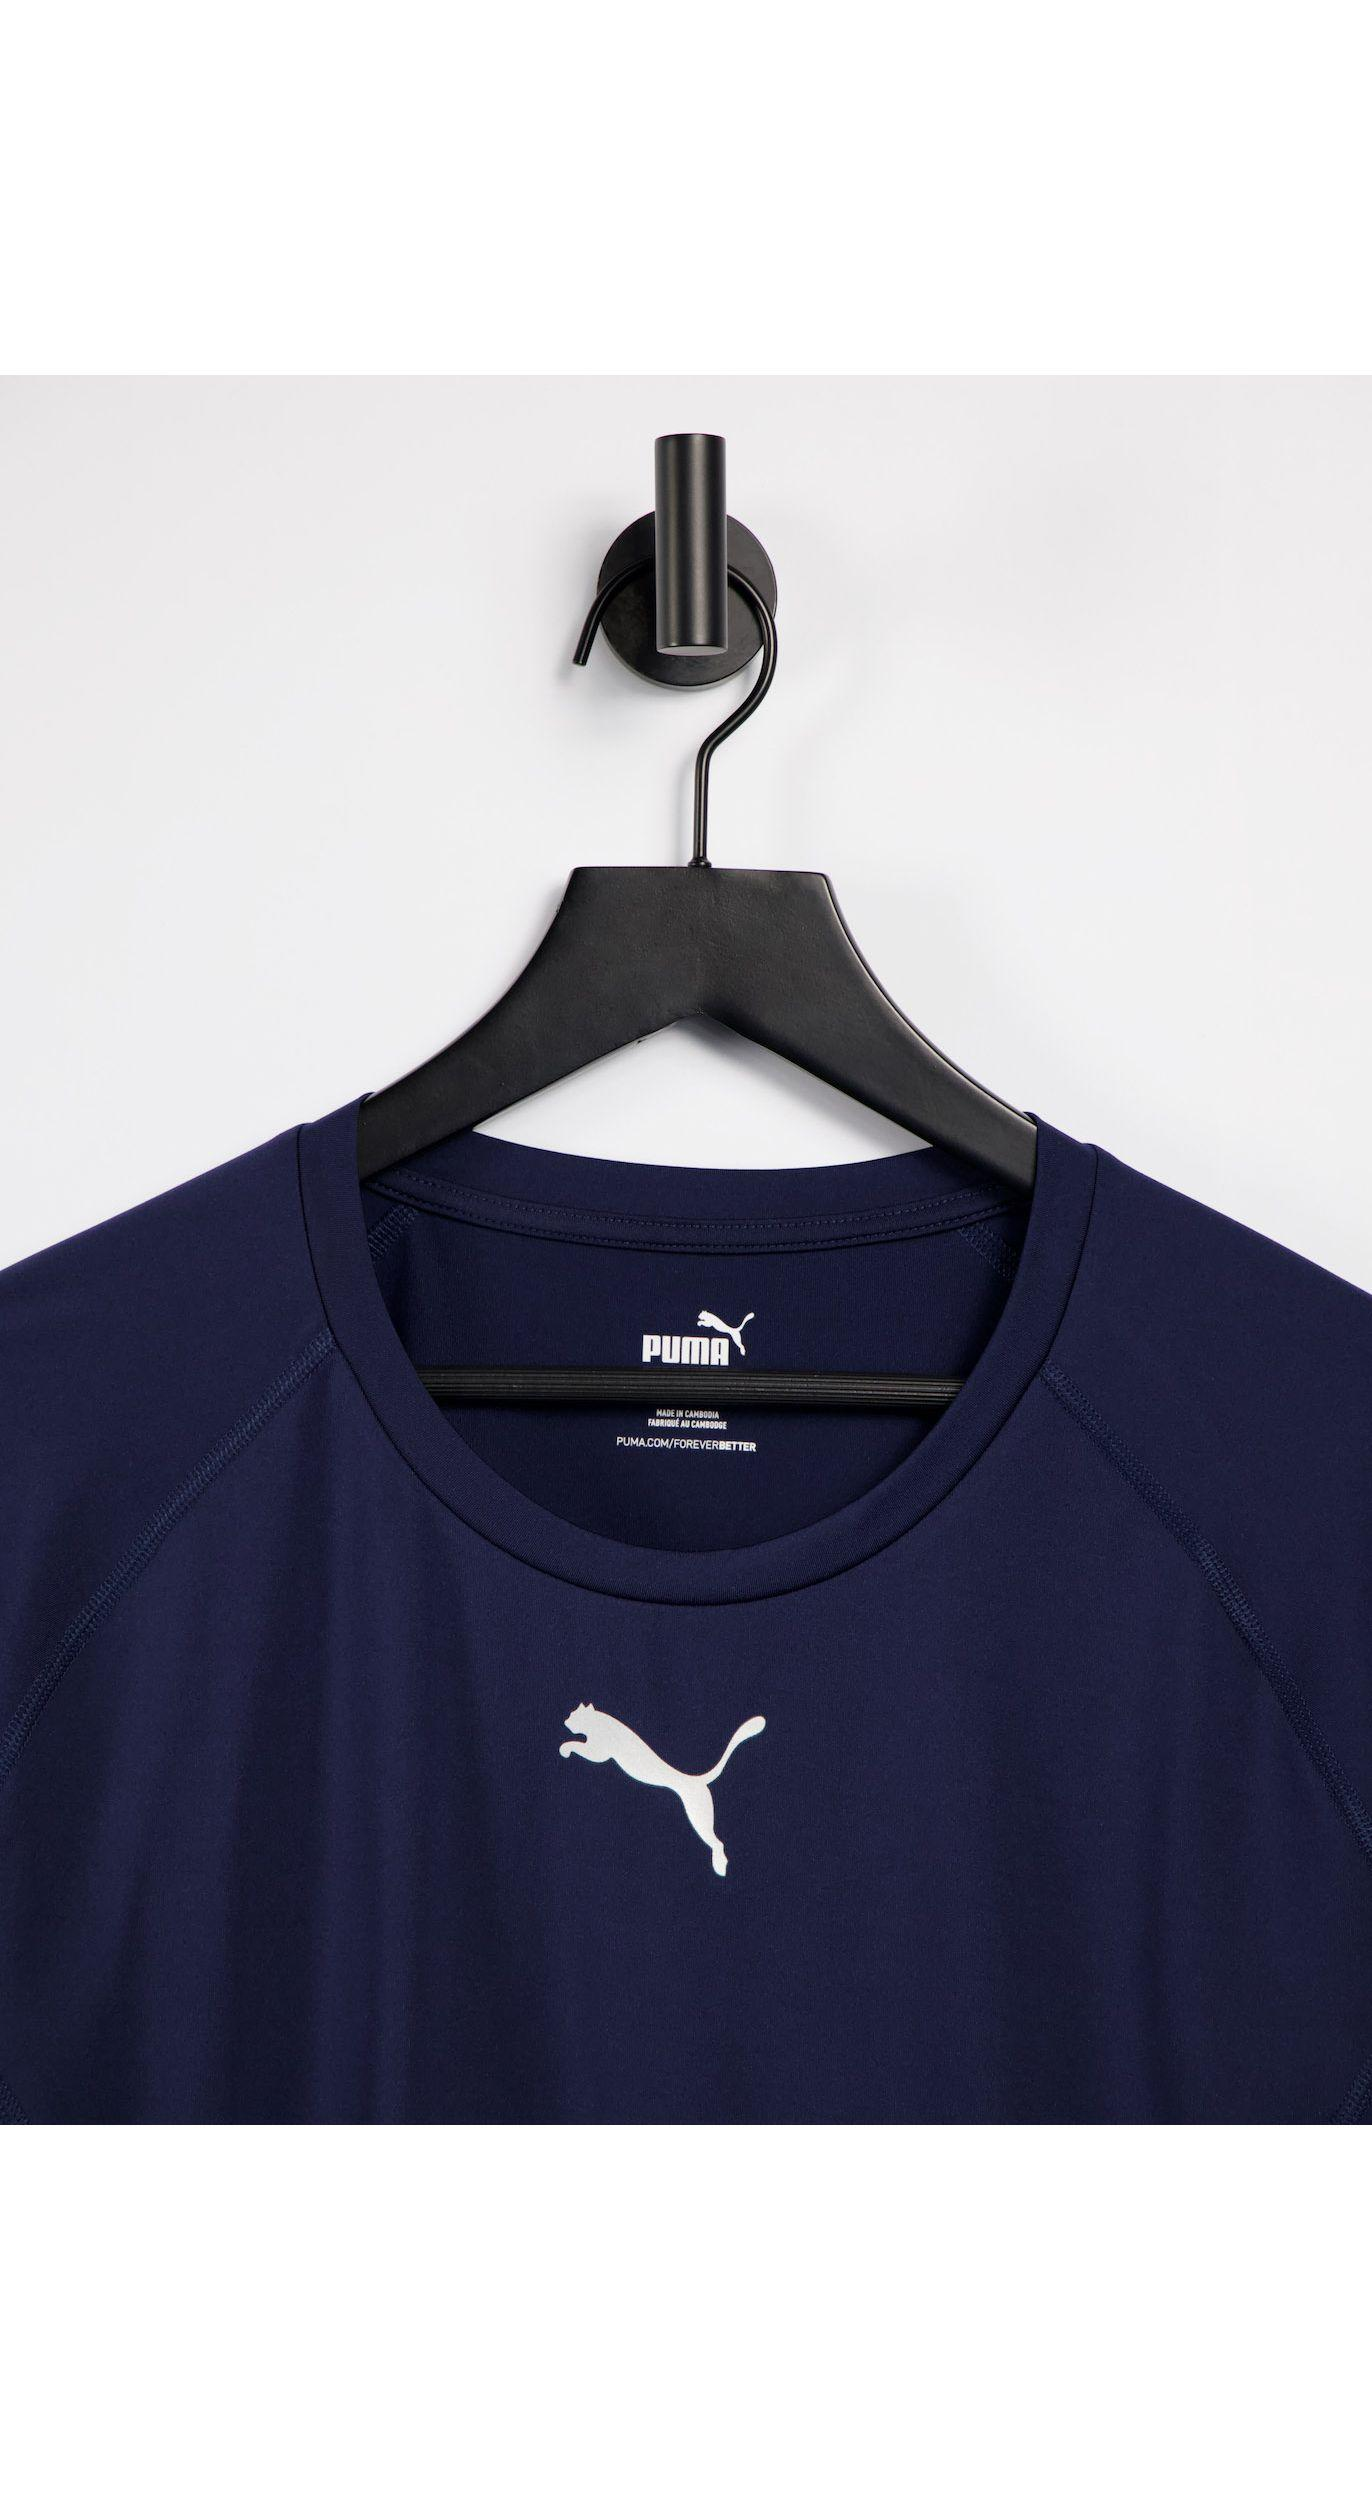 PUMA La Liga Long Sleeve Baselayer T-shirt in Navy (Blue) for Men ...